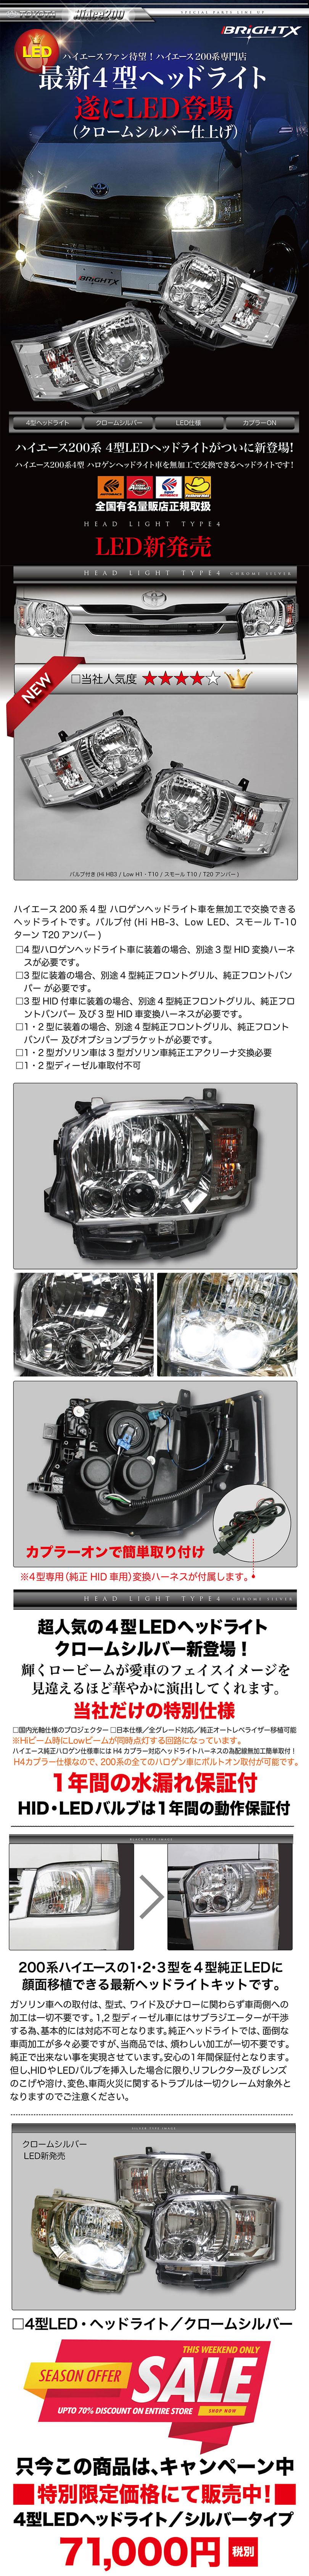 ■TOYOTA トヨタ ■ 200系 ハイエース HIACE hiace 4型 ヘッドライト LED仕様 【 クロームシルバー 】【ナロー専用】■ BRiGHTX社ブライトX 1年保証付き【 水漏れも対応 】